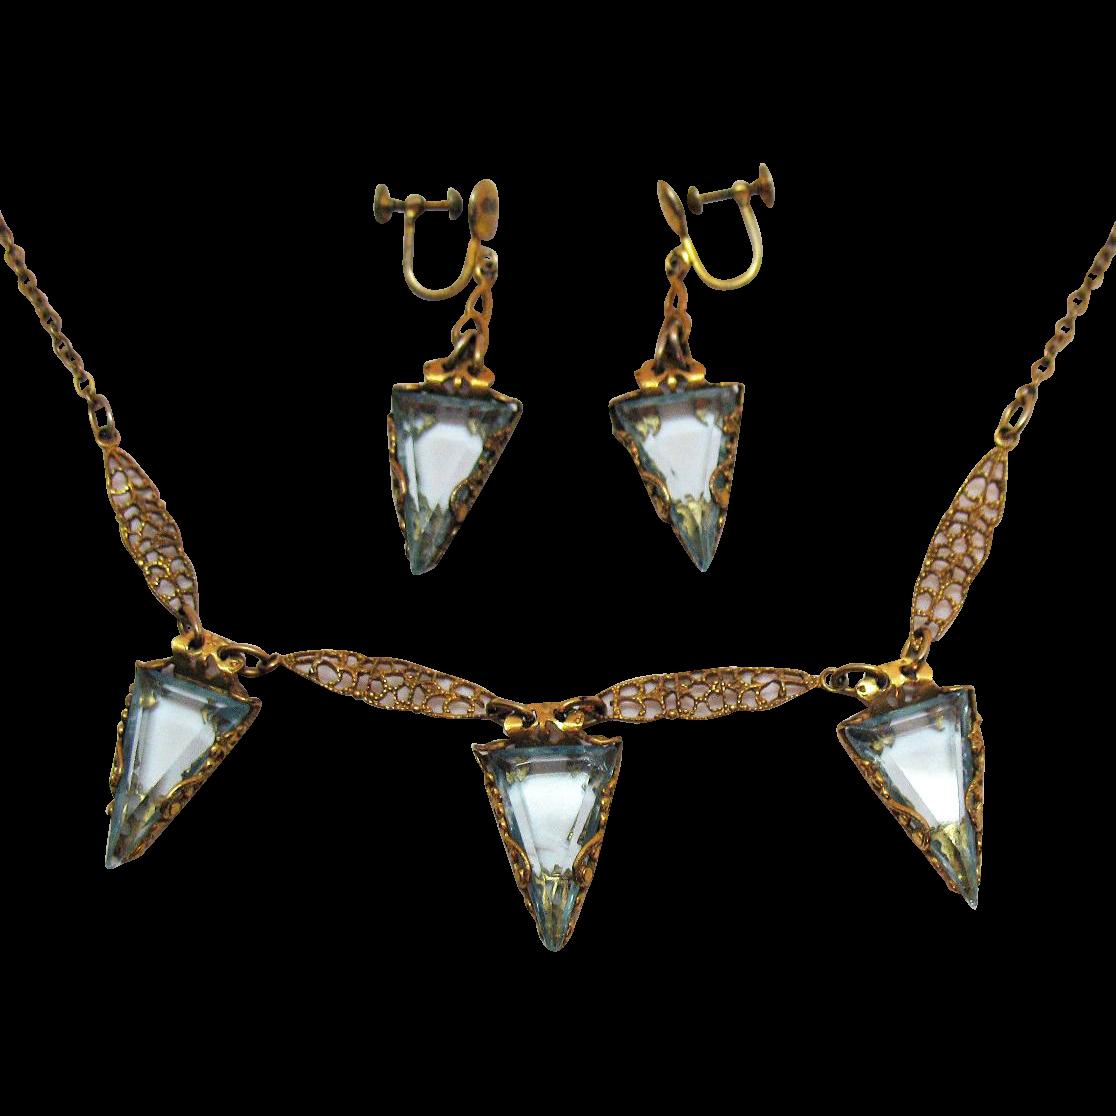 60% OFF Amazing Antique Edwardian Aquamarine Glass Deltoid Stones Handcrafted Filigree Necklace Earrings Set